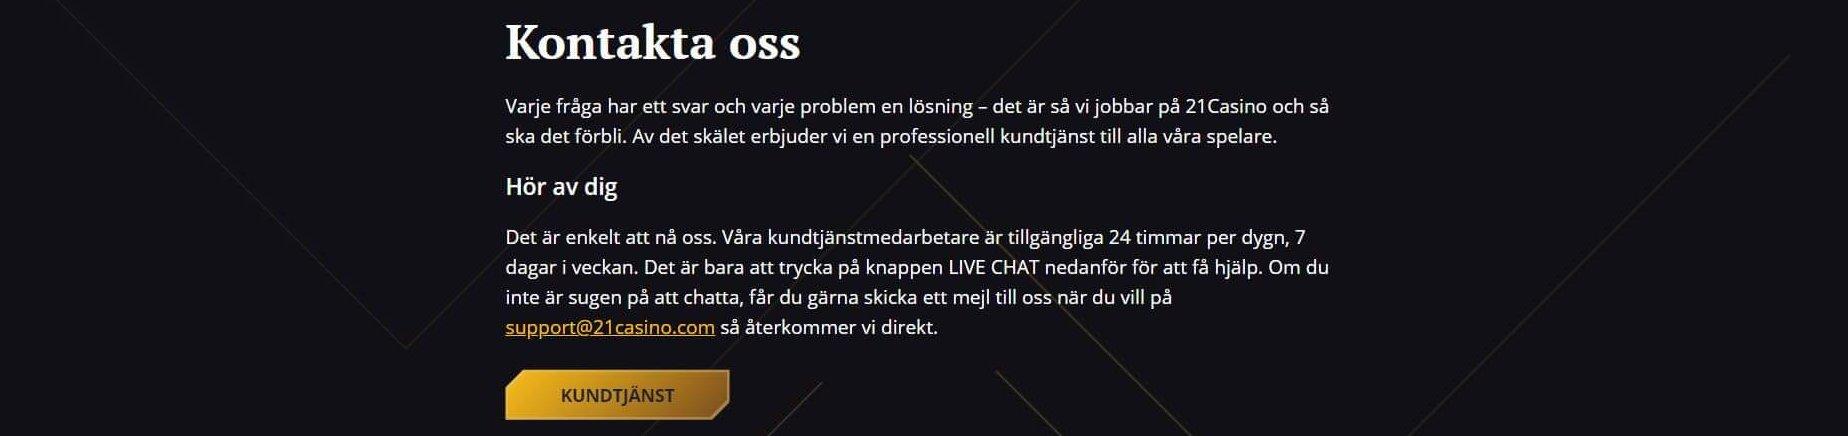 Support ges enbart via epost live chat då 21Casino inte har FAQ